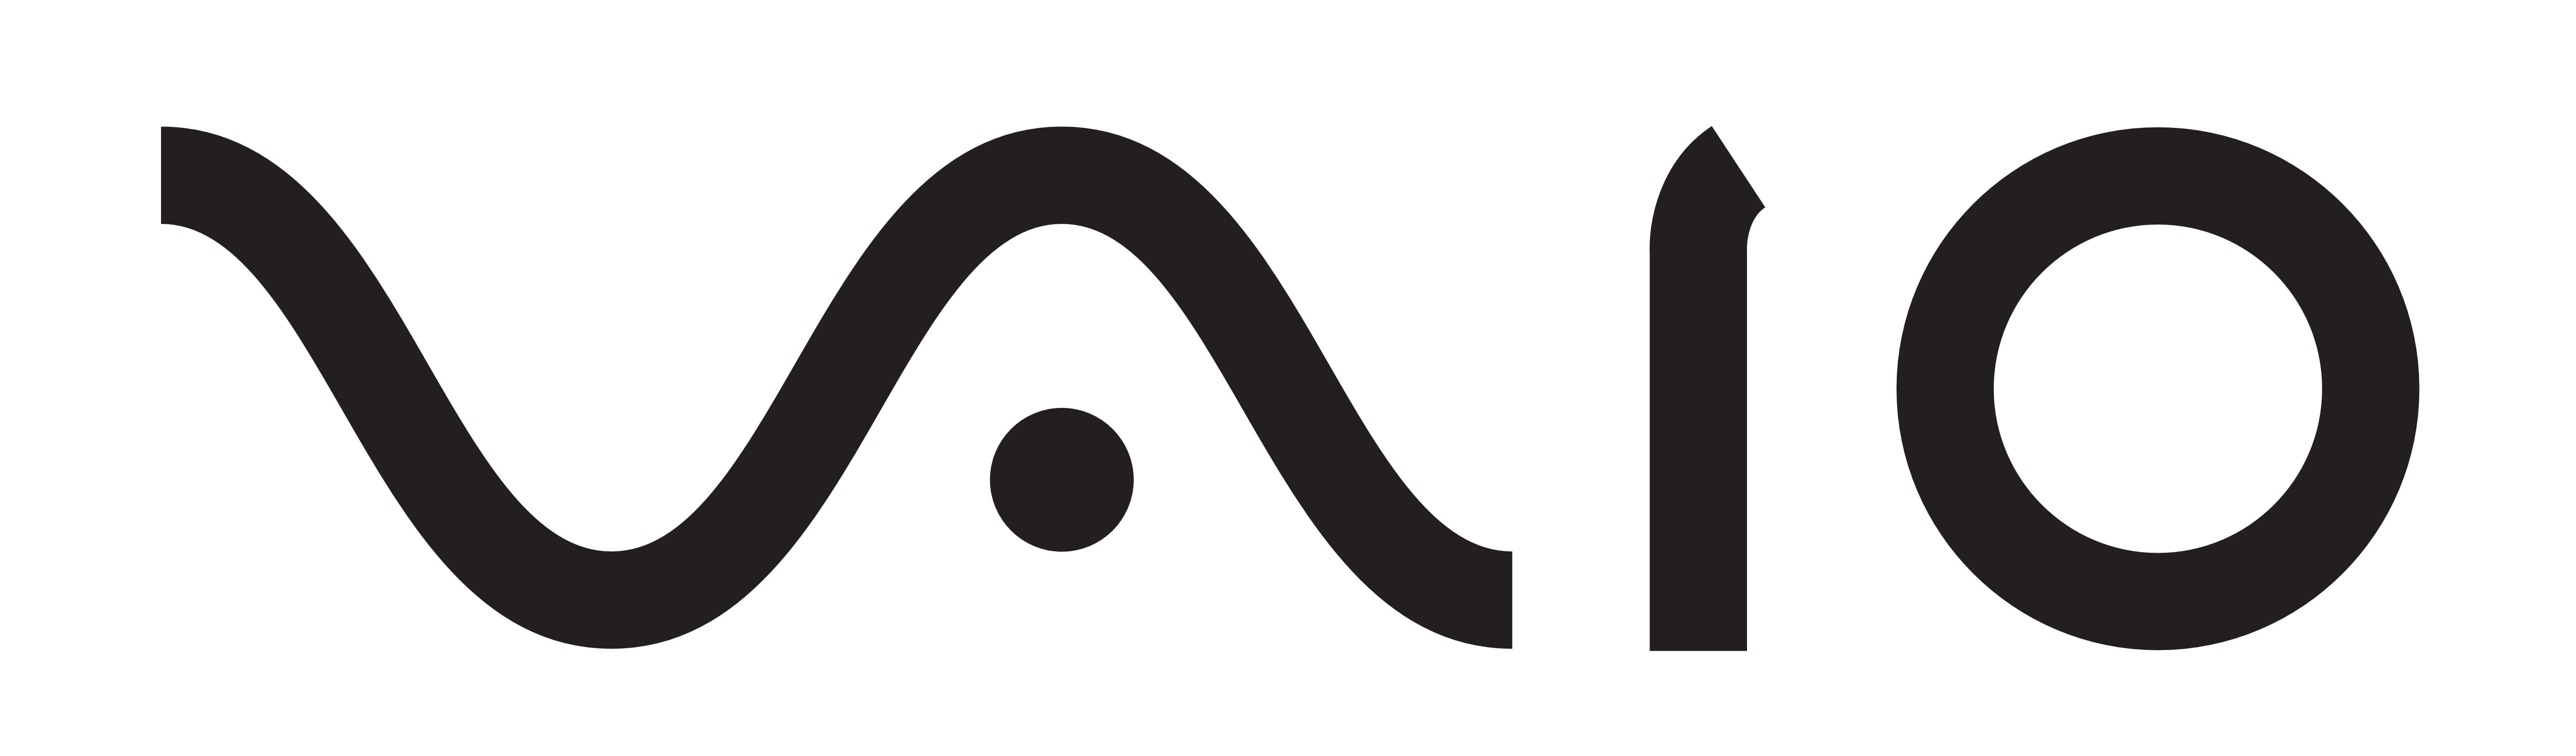 Vaio Logos Download